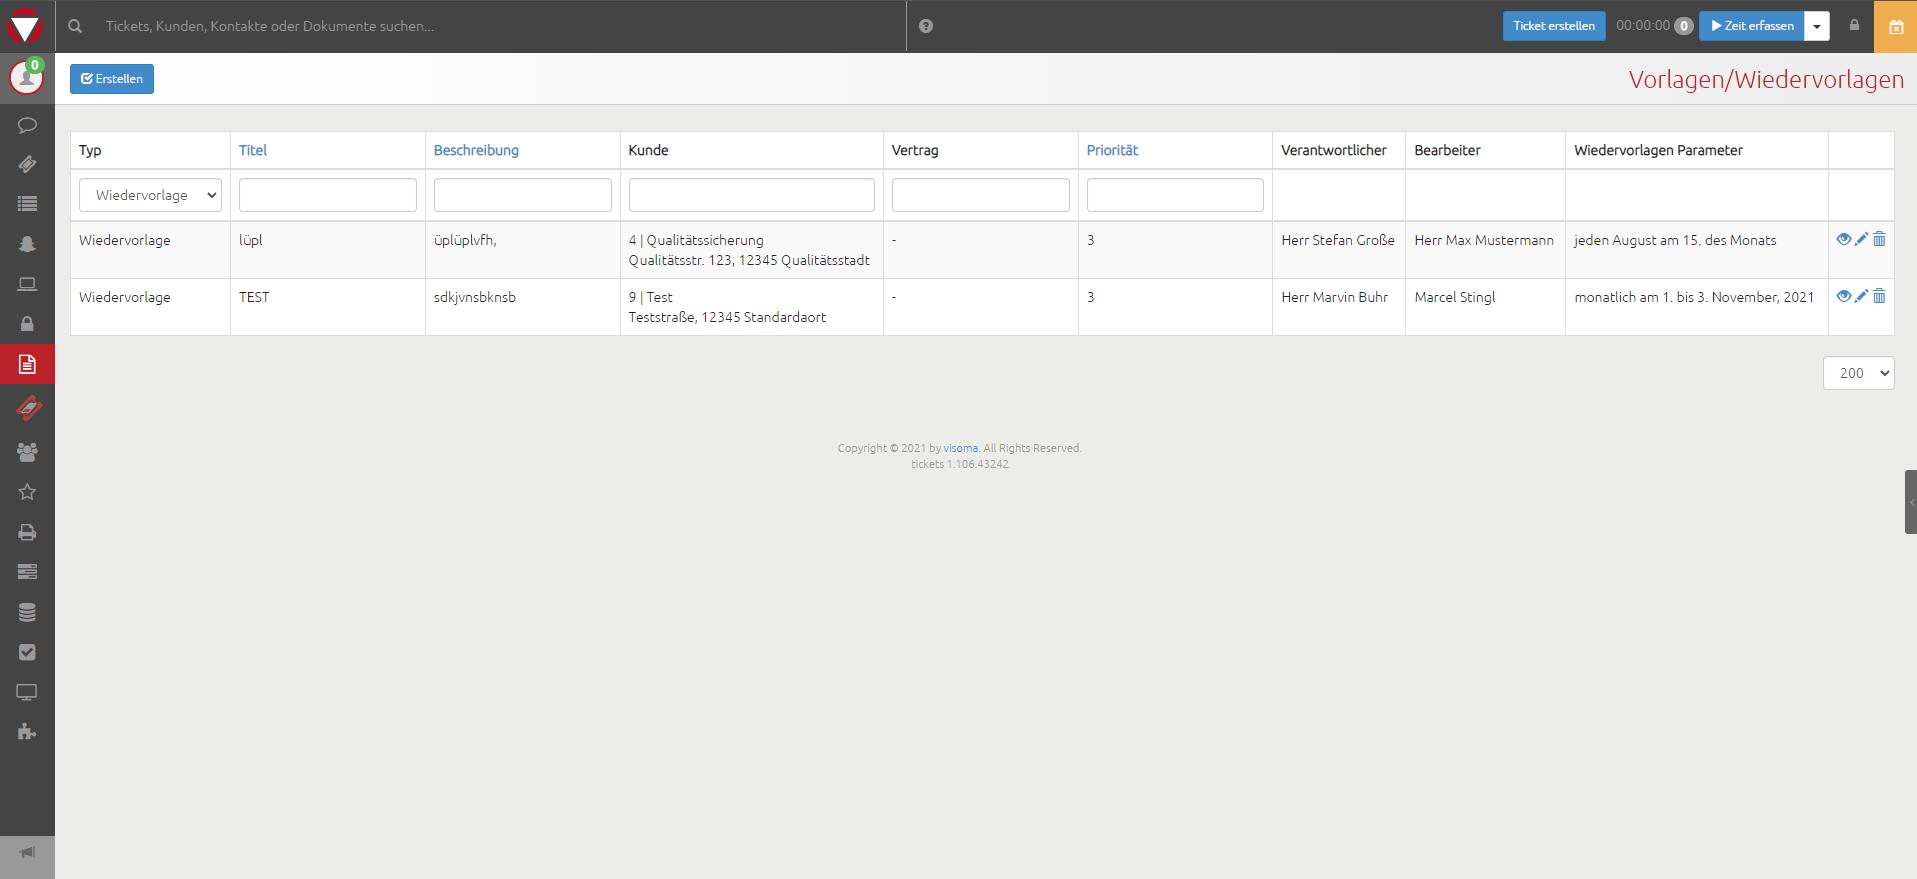 visoma tickets Features Wiedervorlage Managed Service Prozess